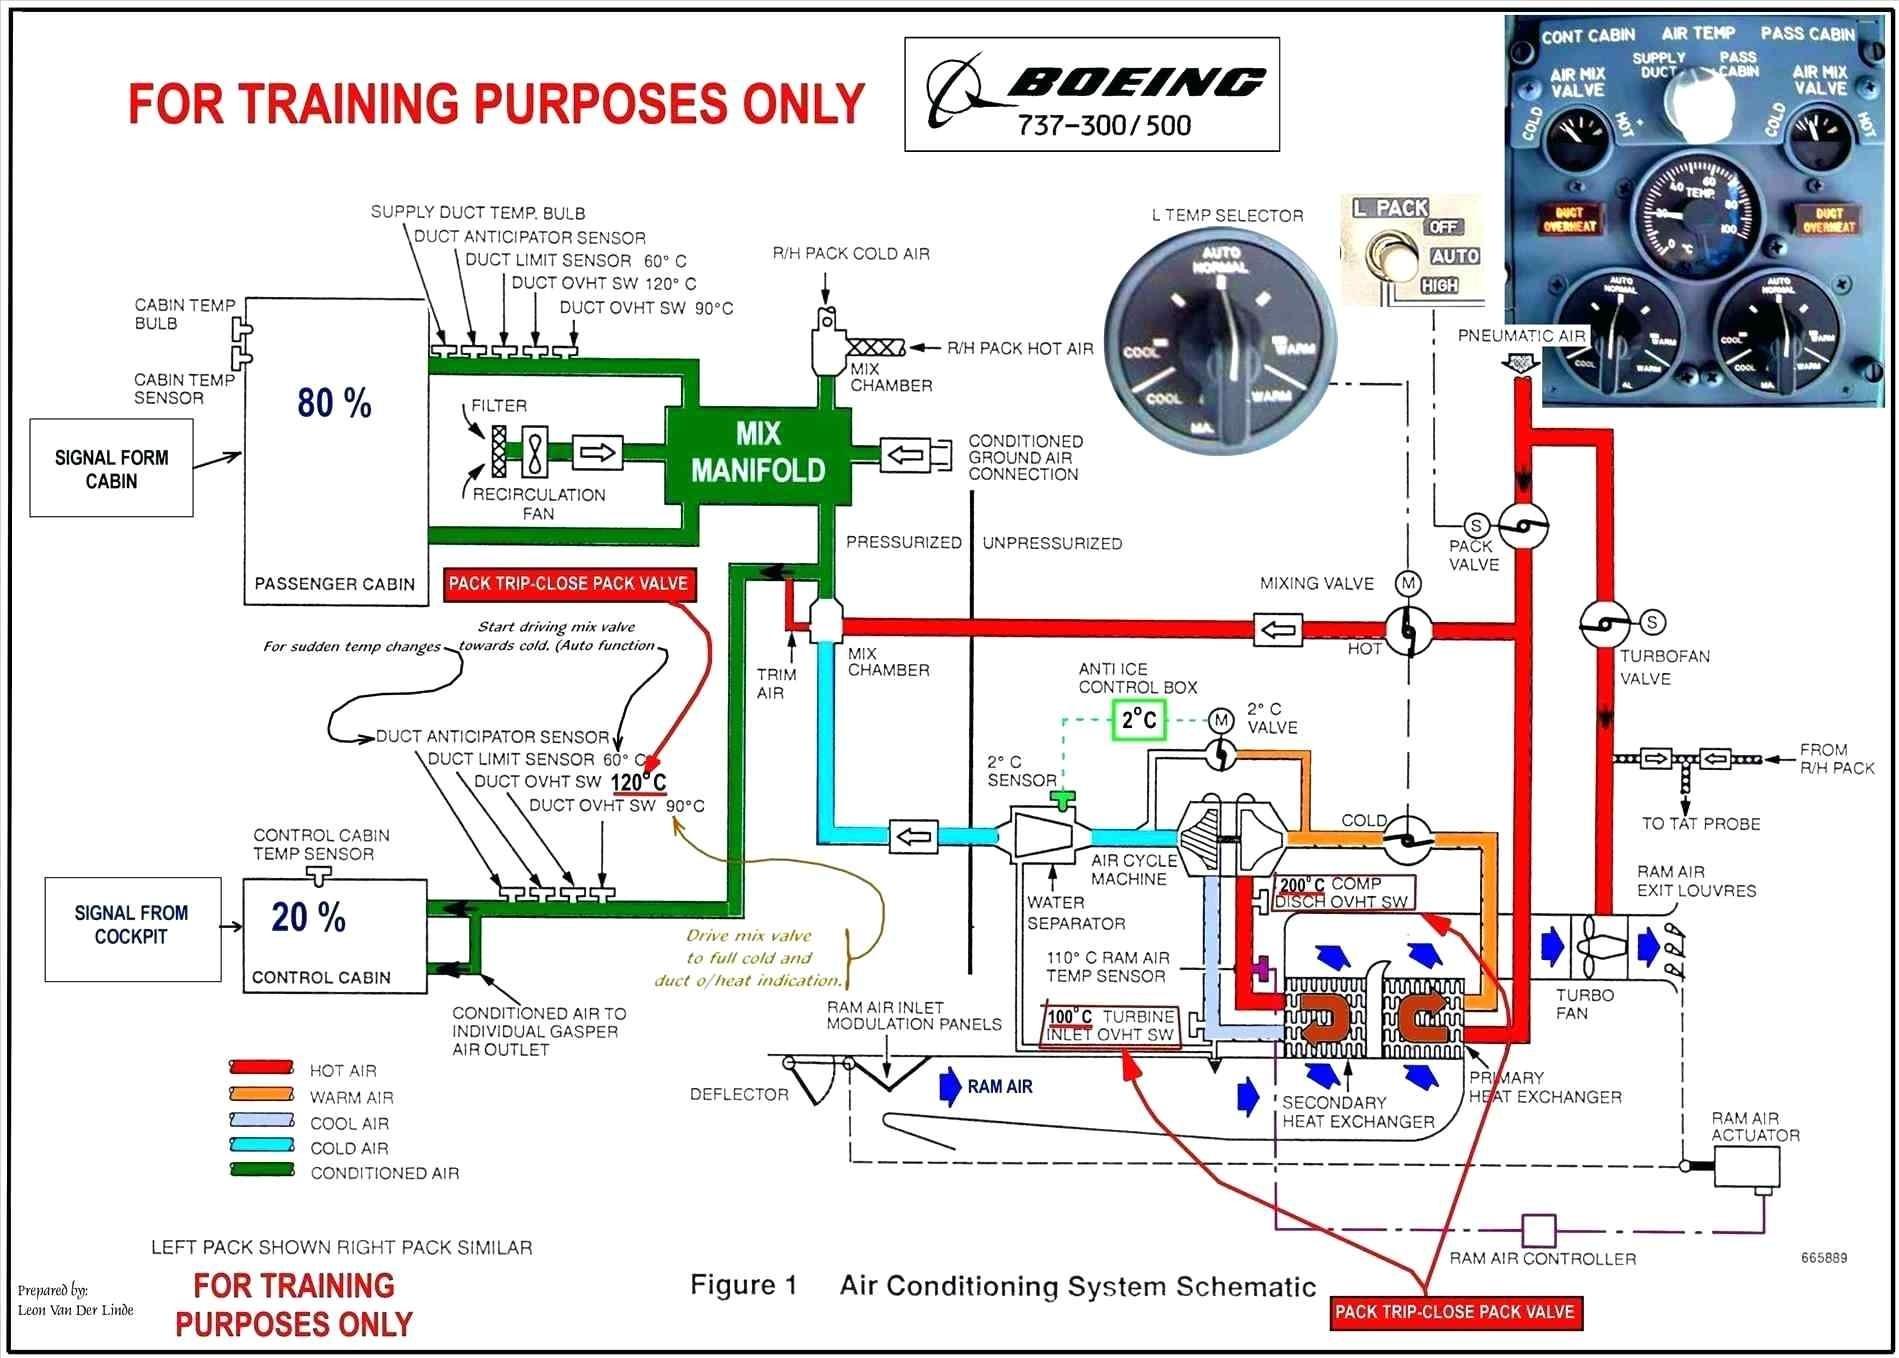 Automobile Ac System Diagram | My Wiring DIagram